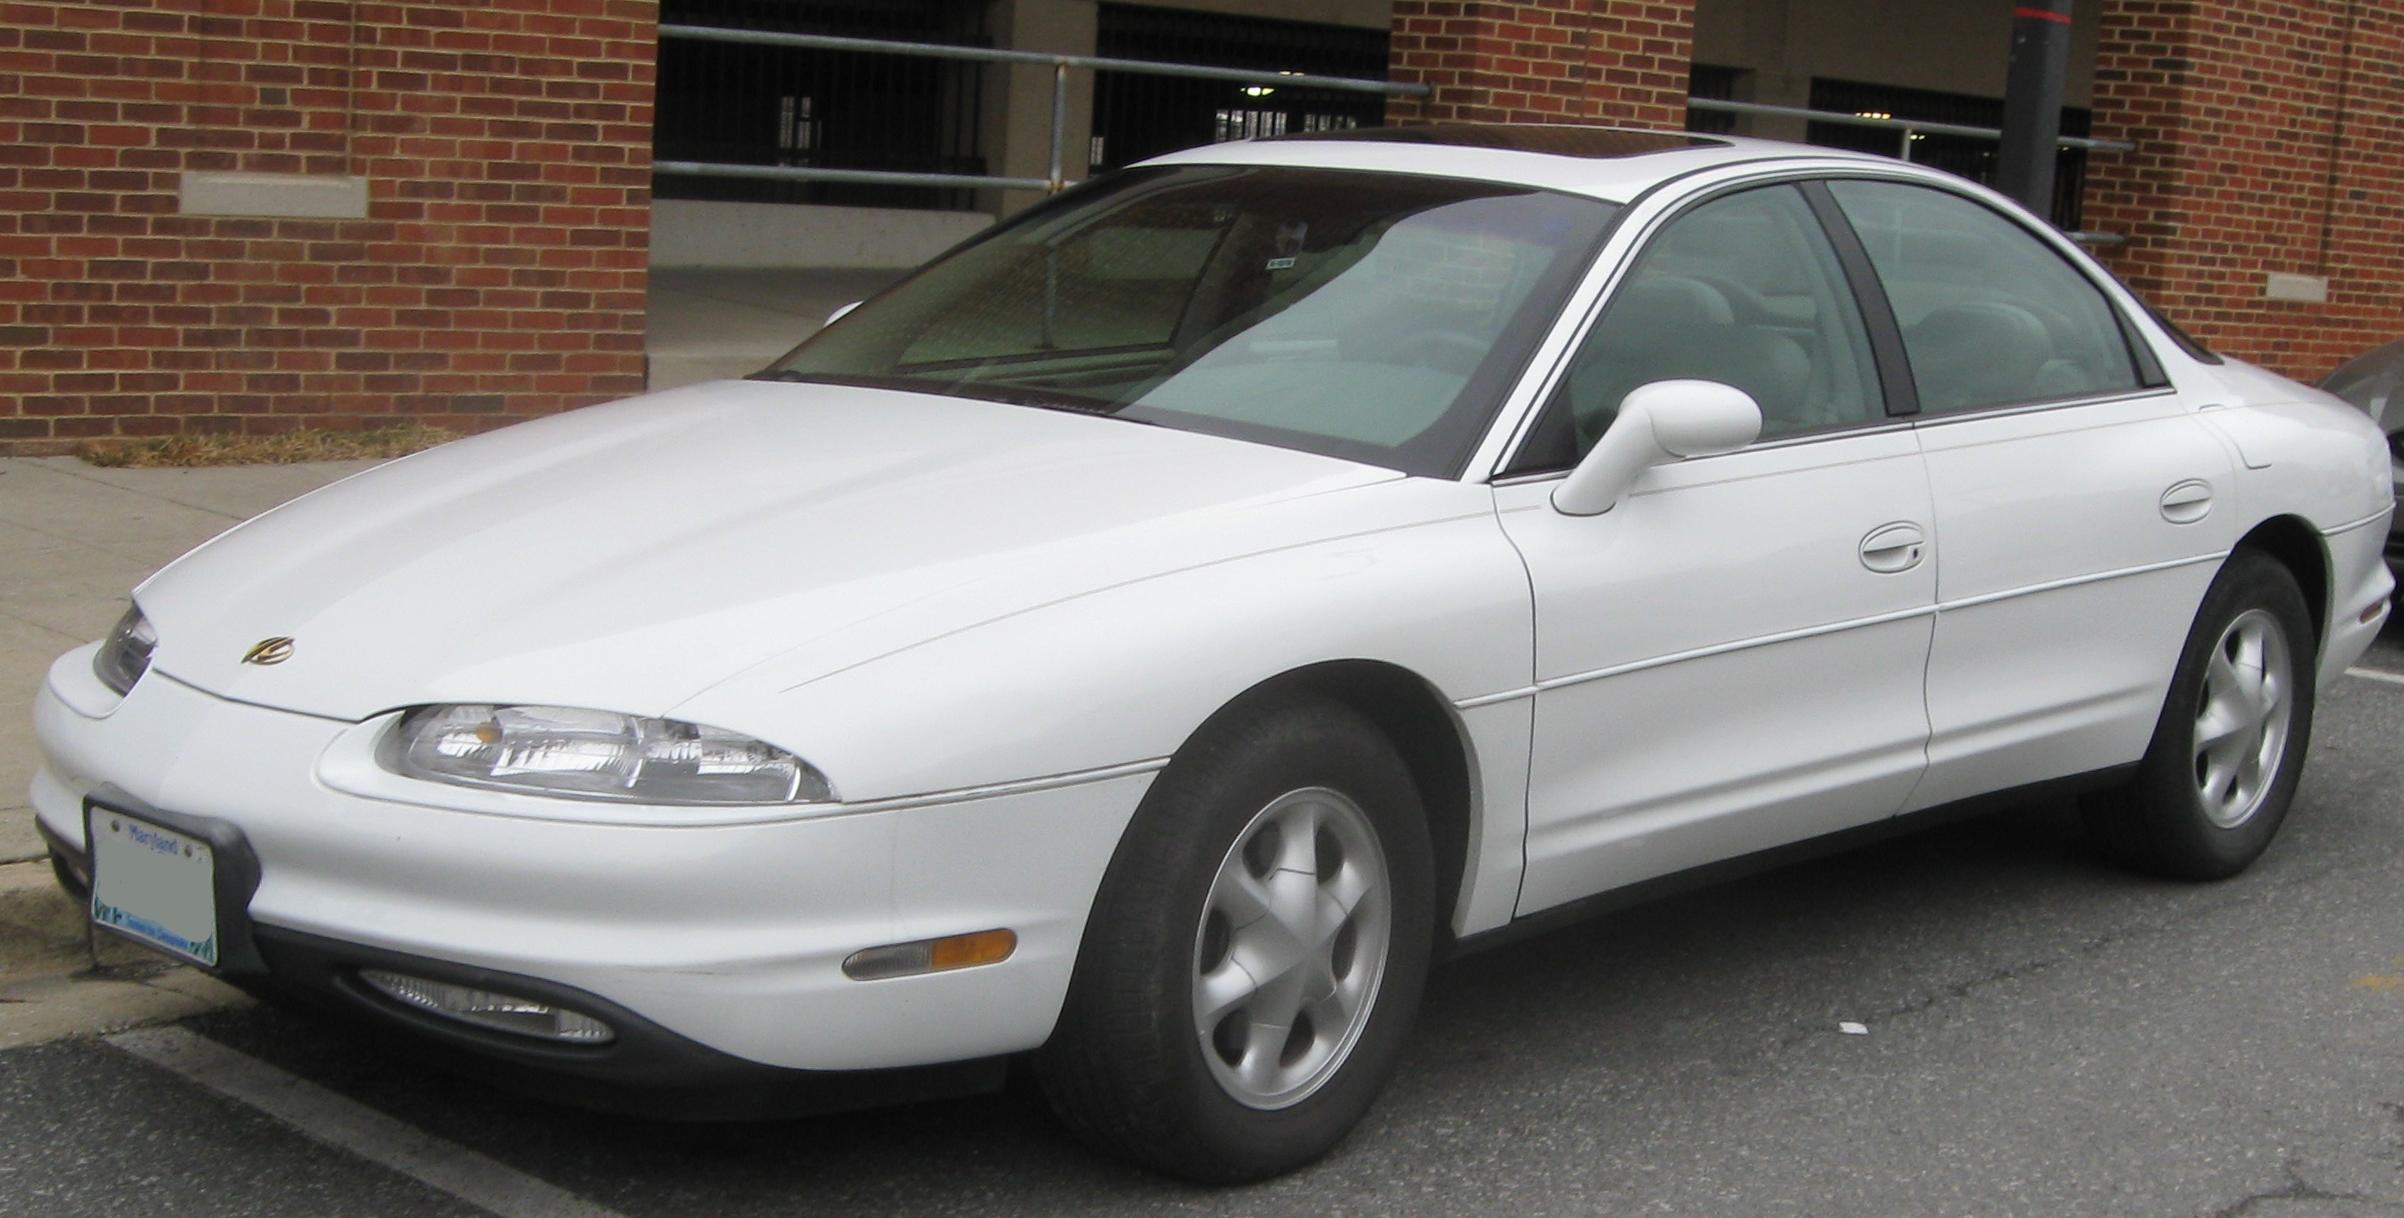 File:1st Oldsmobile Aurora .jpg - Wikipedia, the free encyclopedia